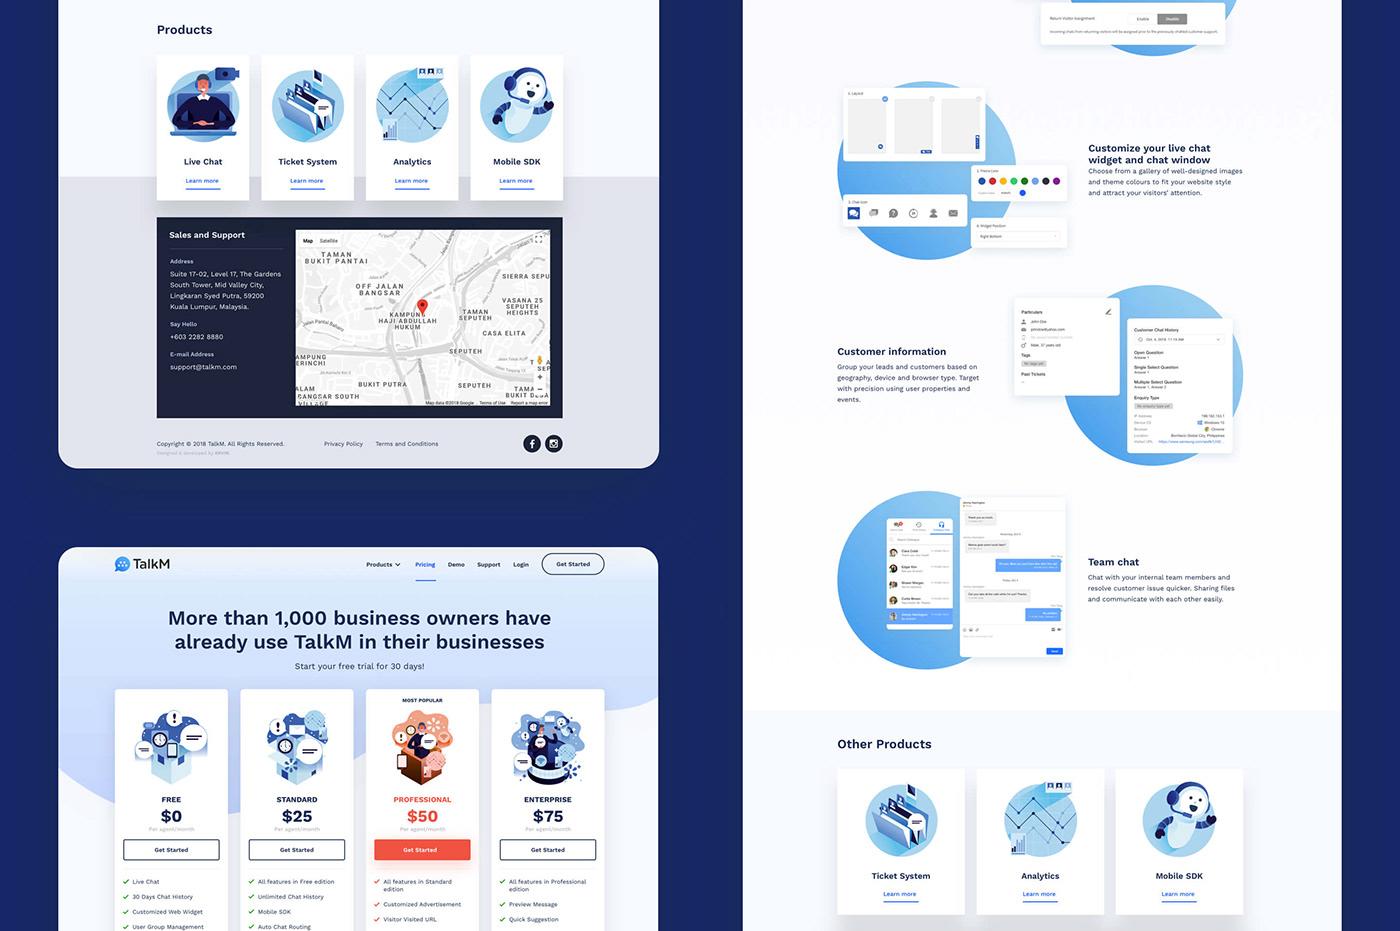 Kervin Tan krvin Intercom zendesk live chat landing page CRM analytics support mobile